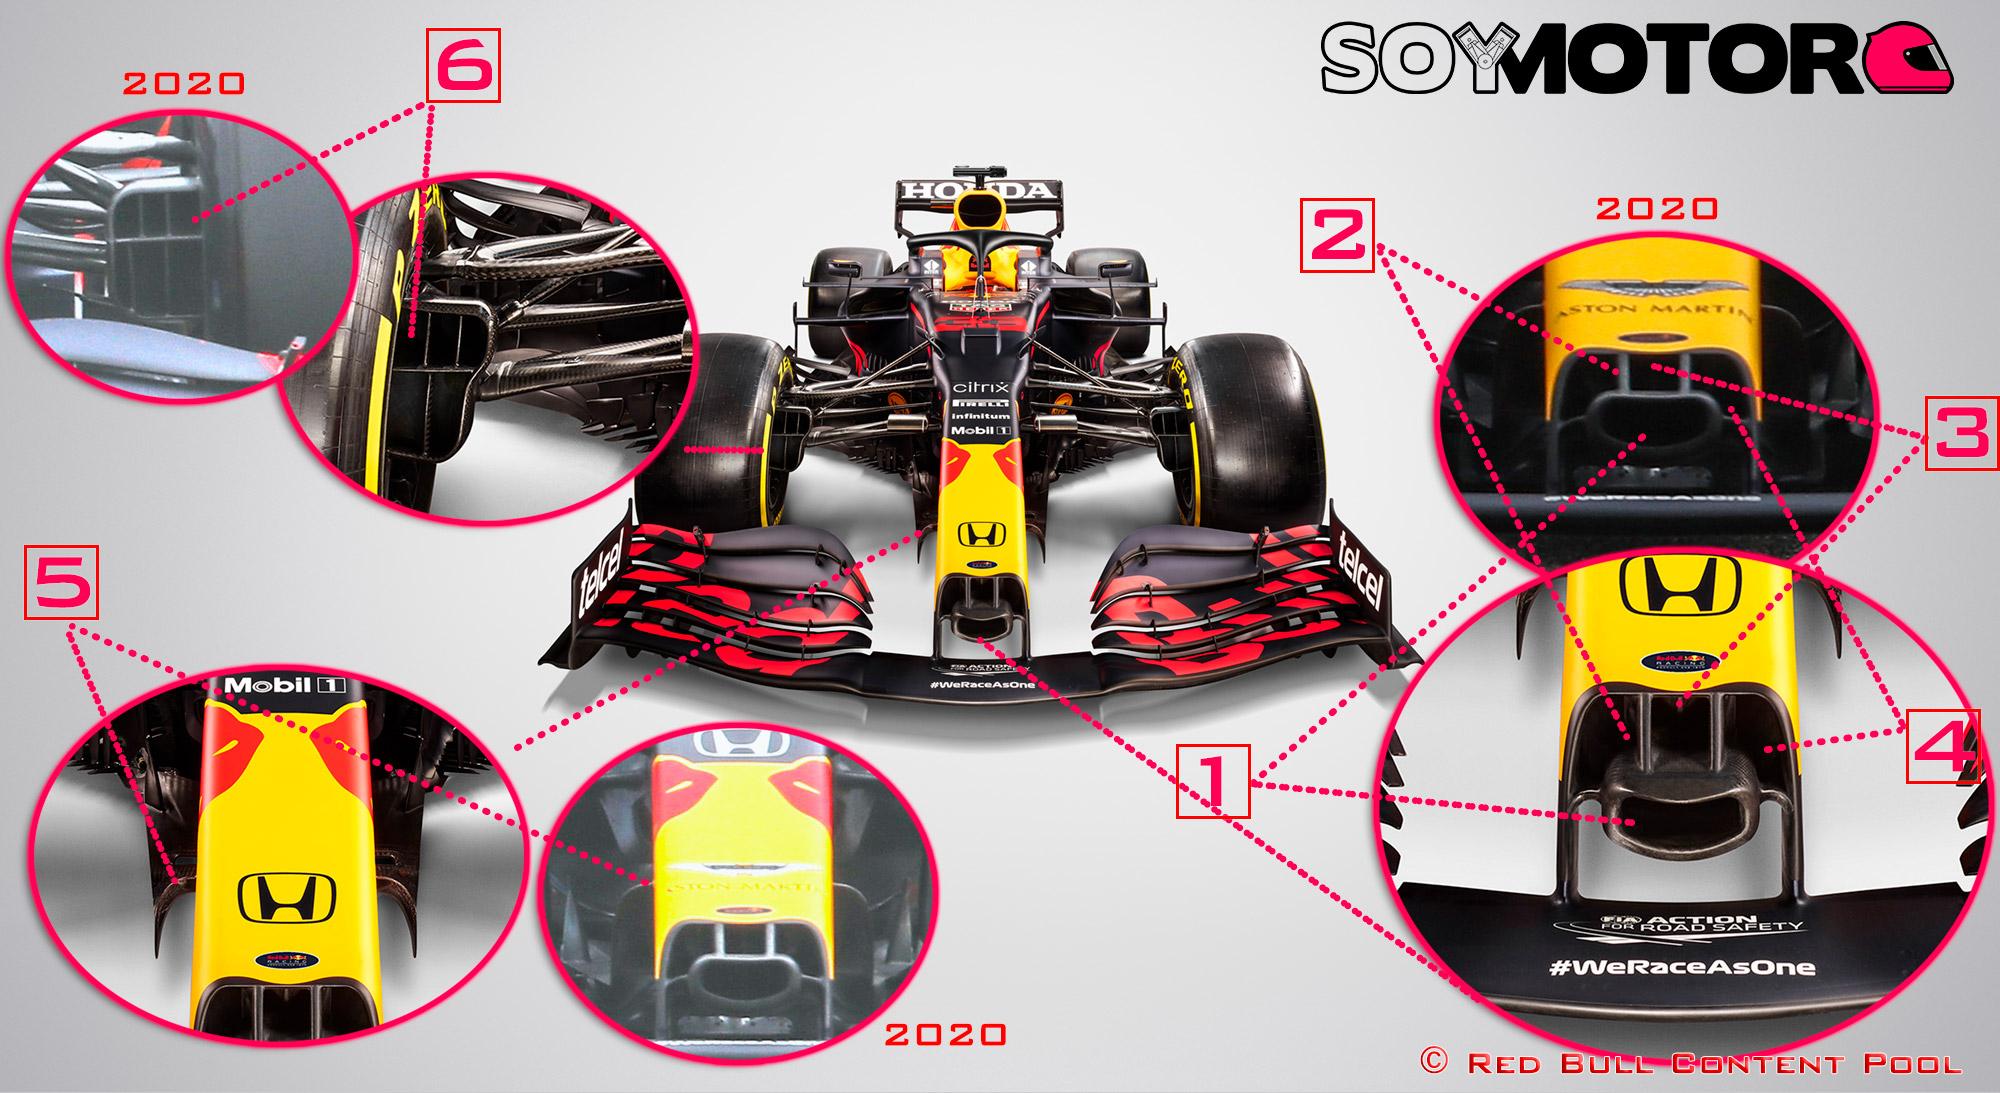 red-bull-frontal-1-soymotor.jpg